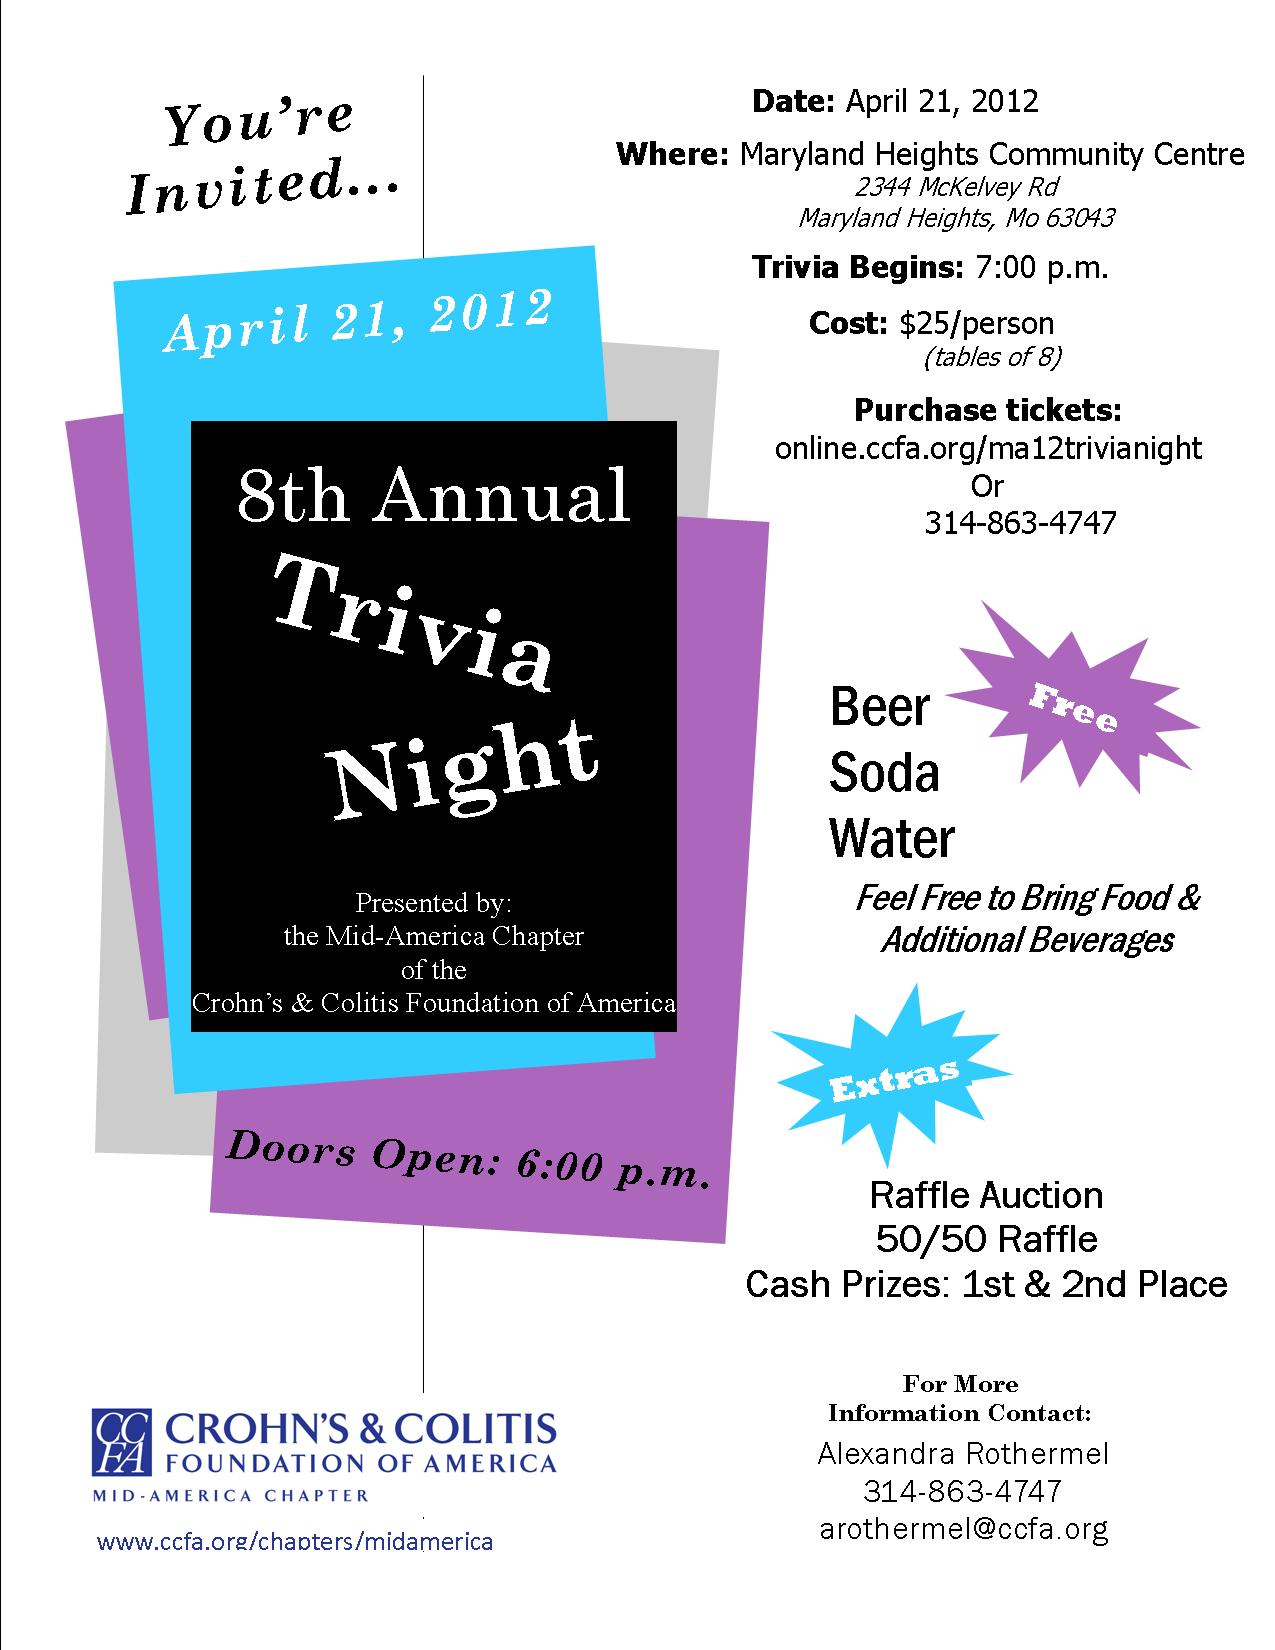 trivia night flyer design